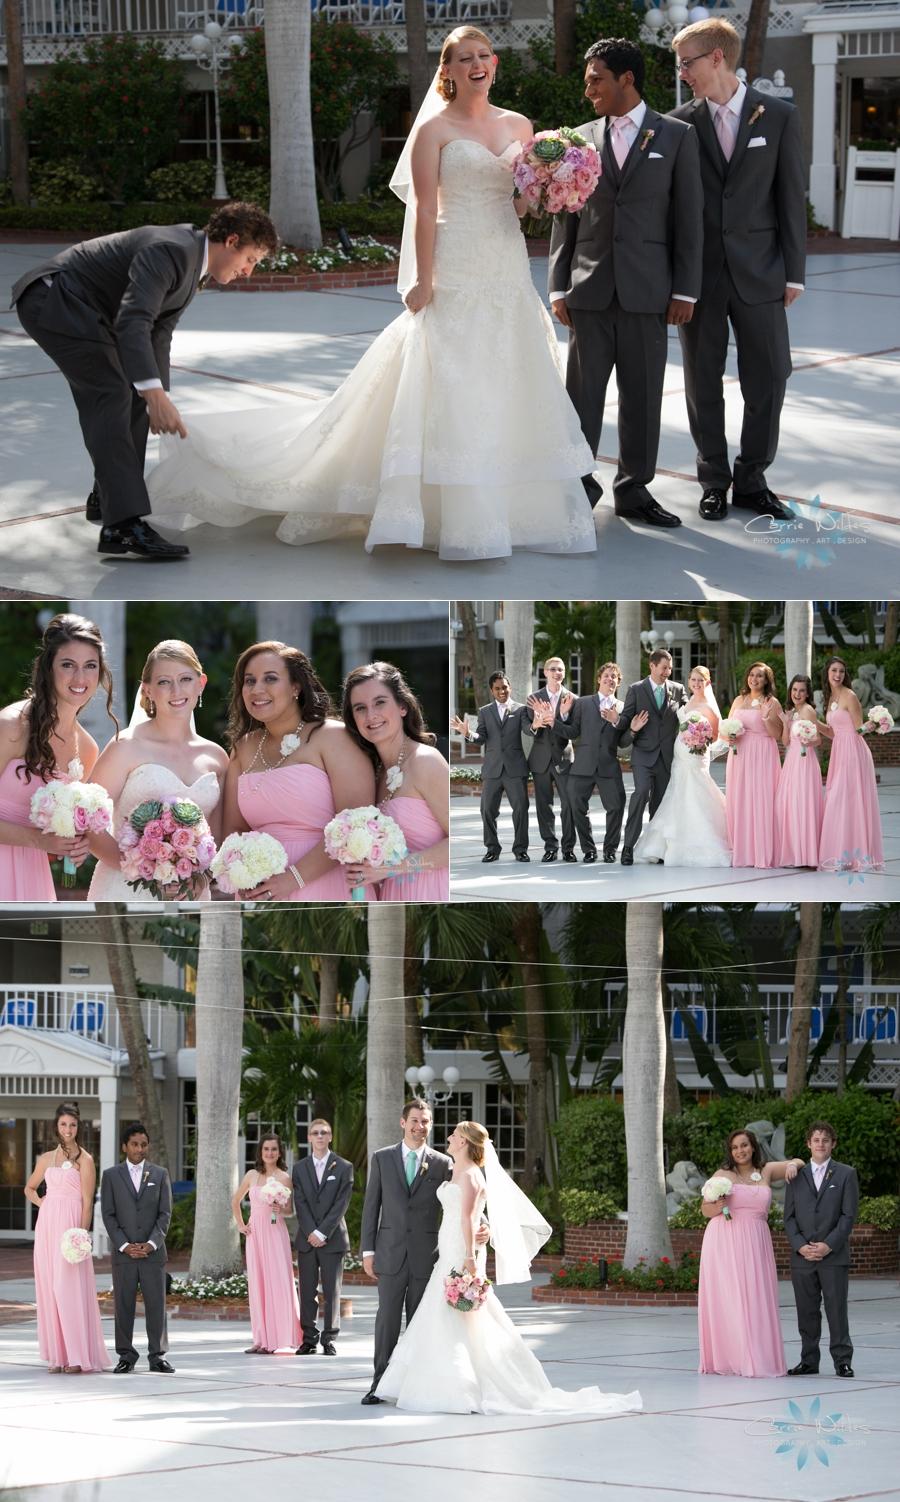 6_21_13 Tradewinds St. Pete Beach Wedding_0006.jpg